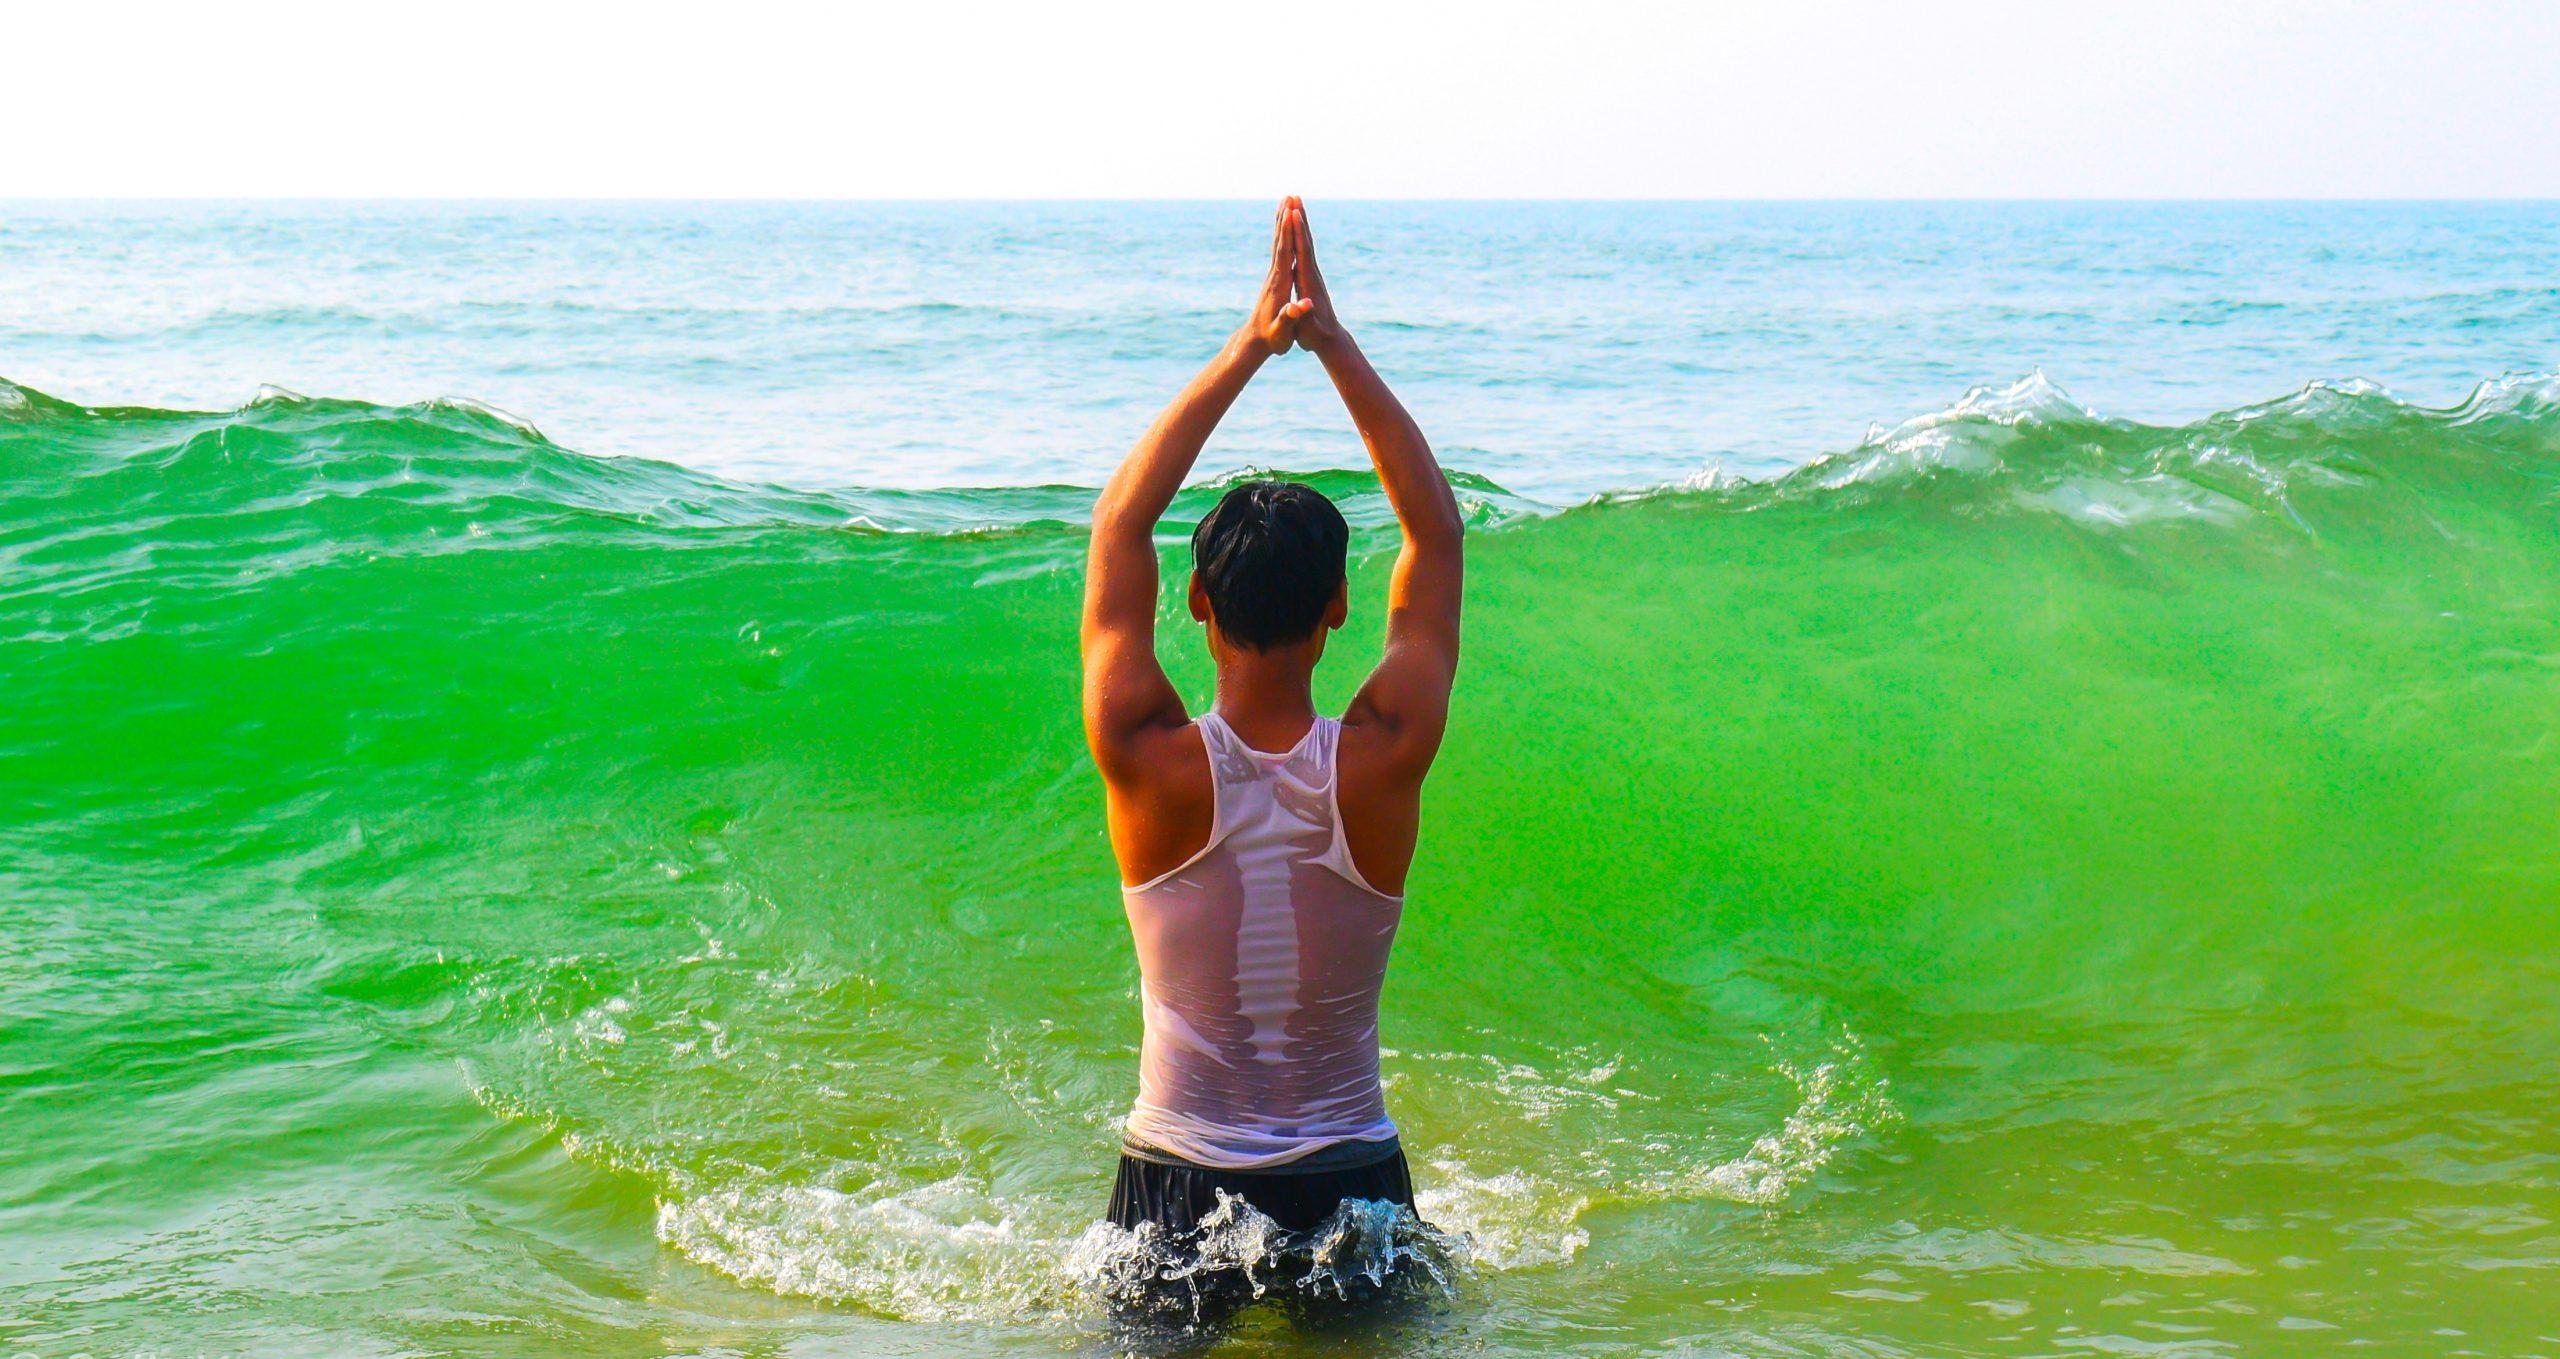 A boy praying god in sea water